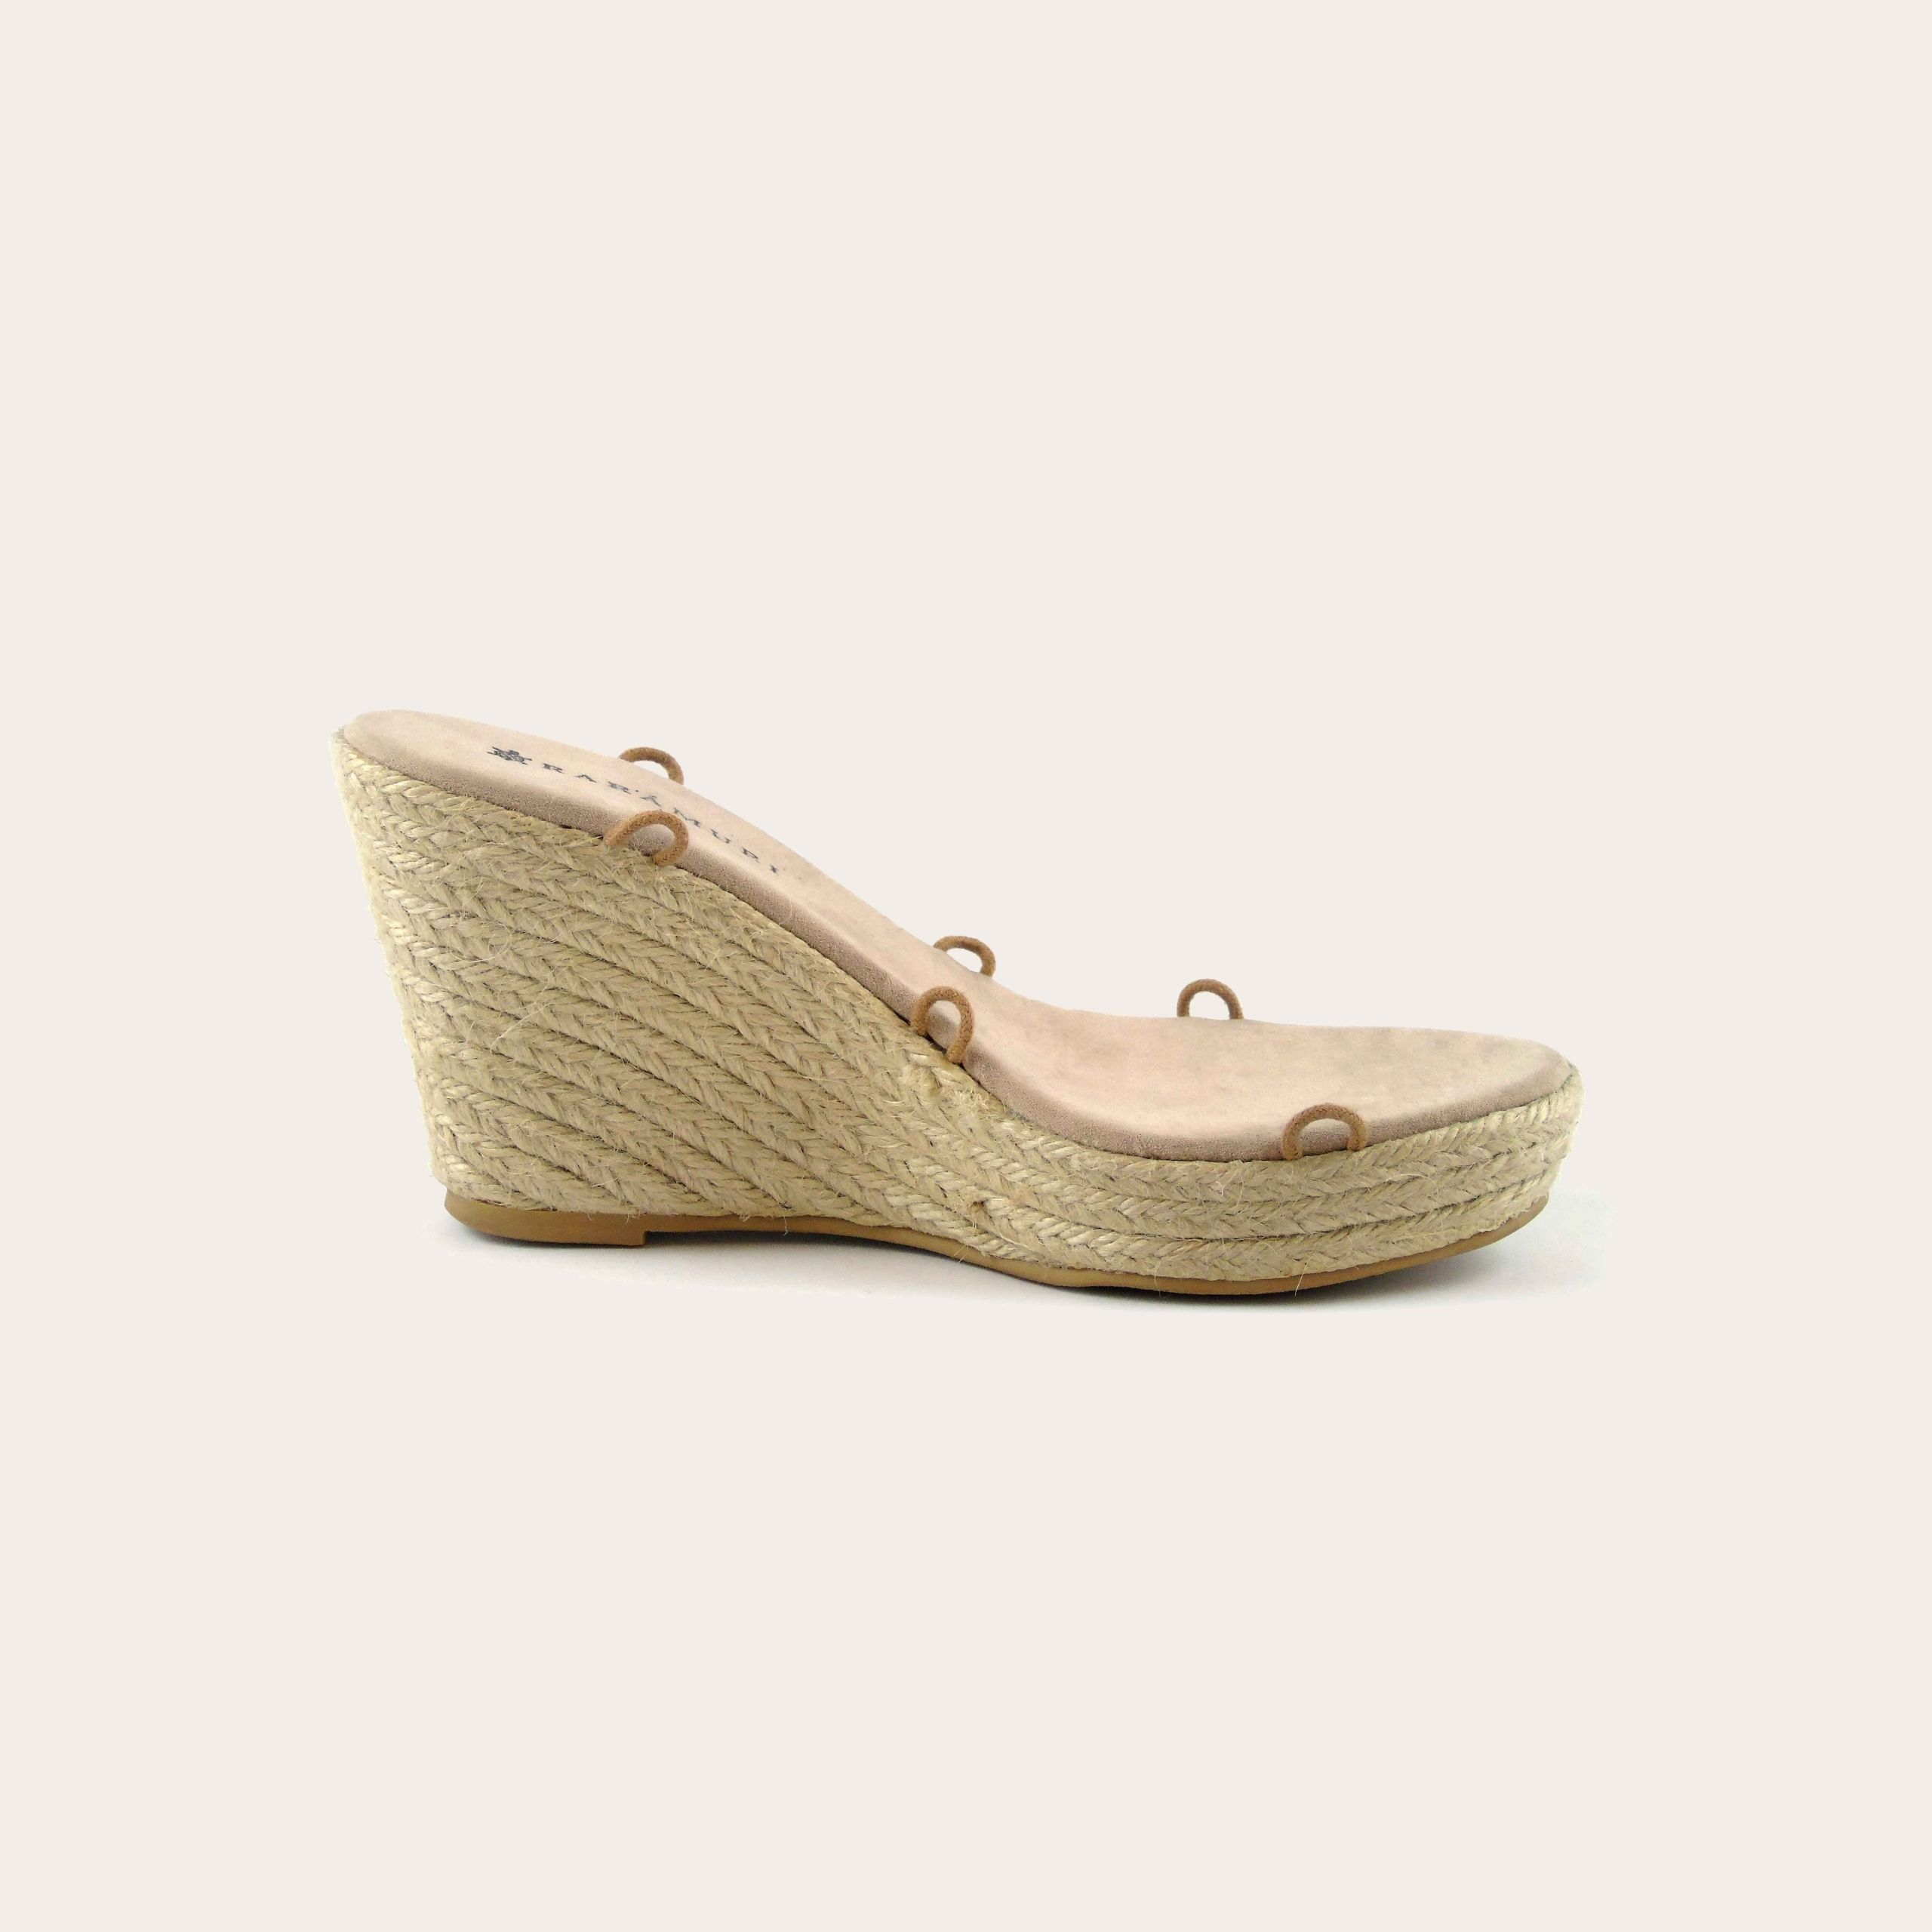 chilon_4_lintsandalen sandals travelsandals vegan sustainable sandals wikkelsandalen